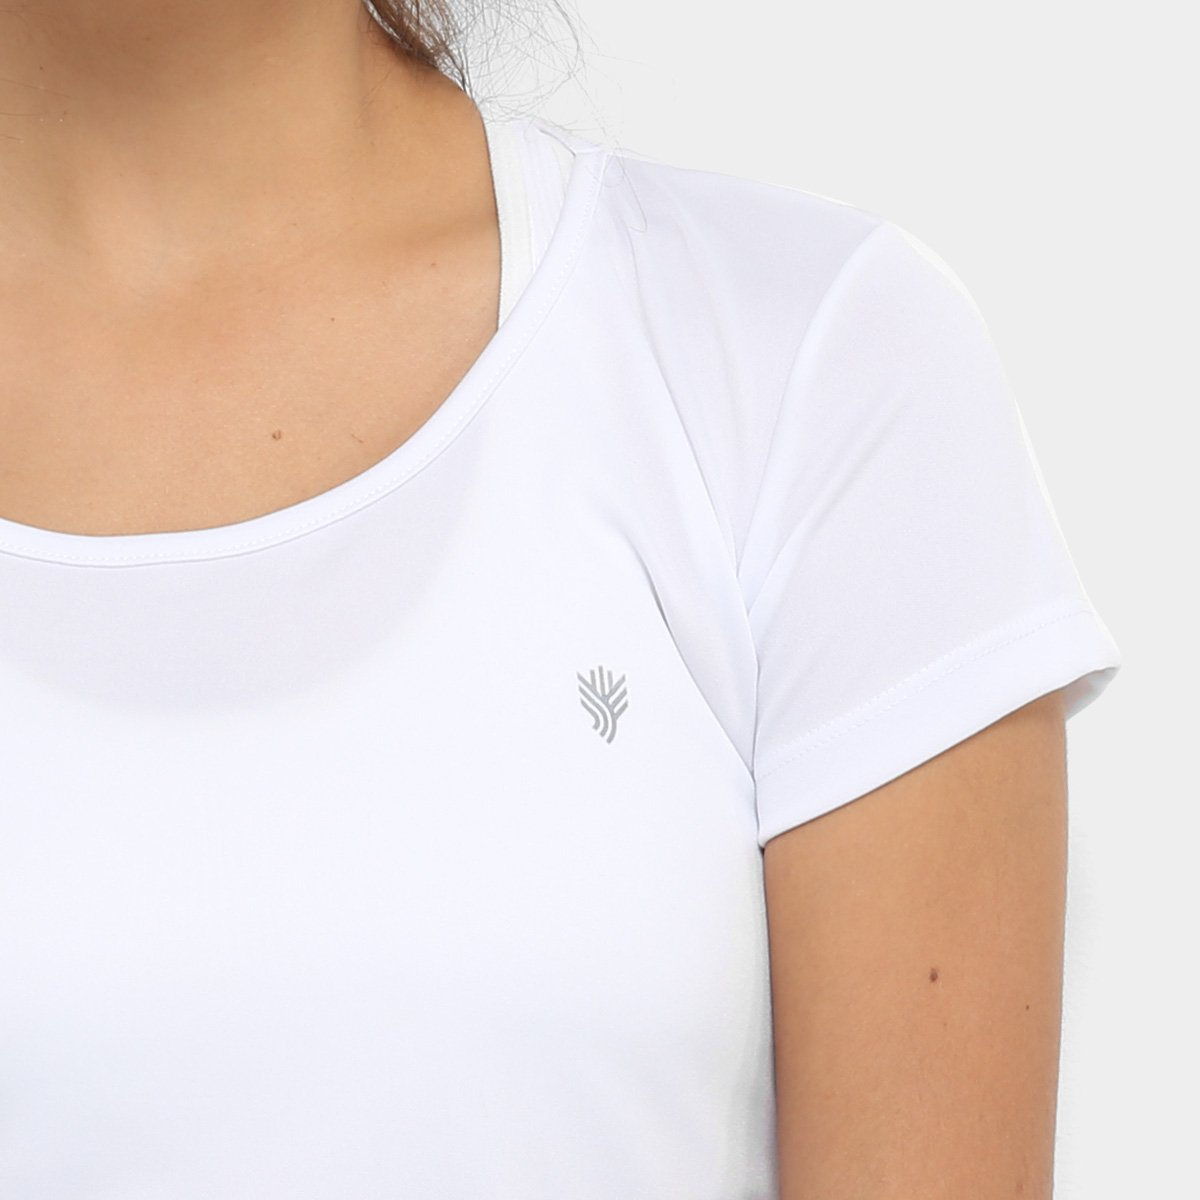 Feminina Camiseta Gonew Branco Básica Básica Feminina Branco Camiseta Gonew v4fxWwf0qd